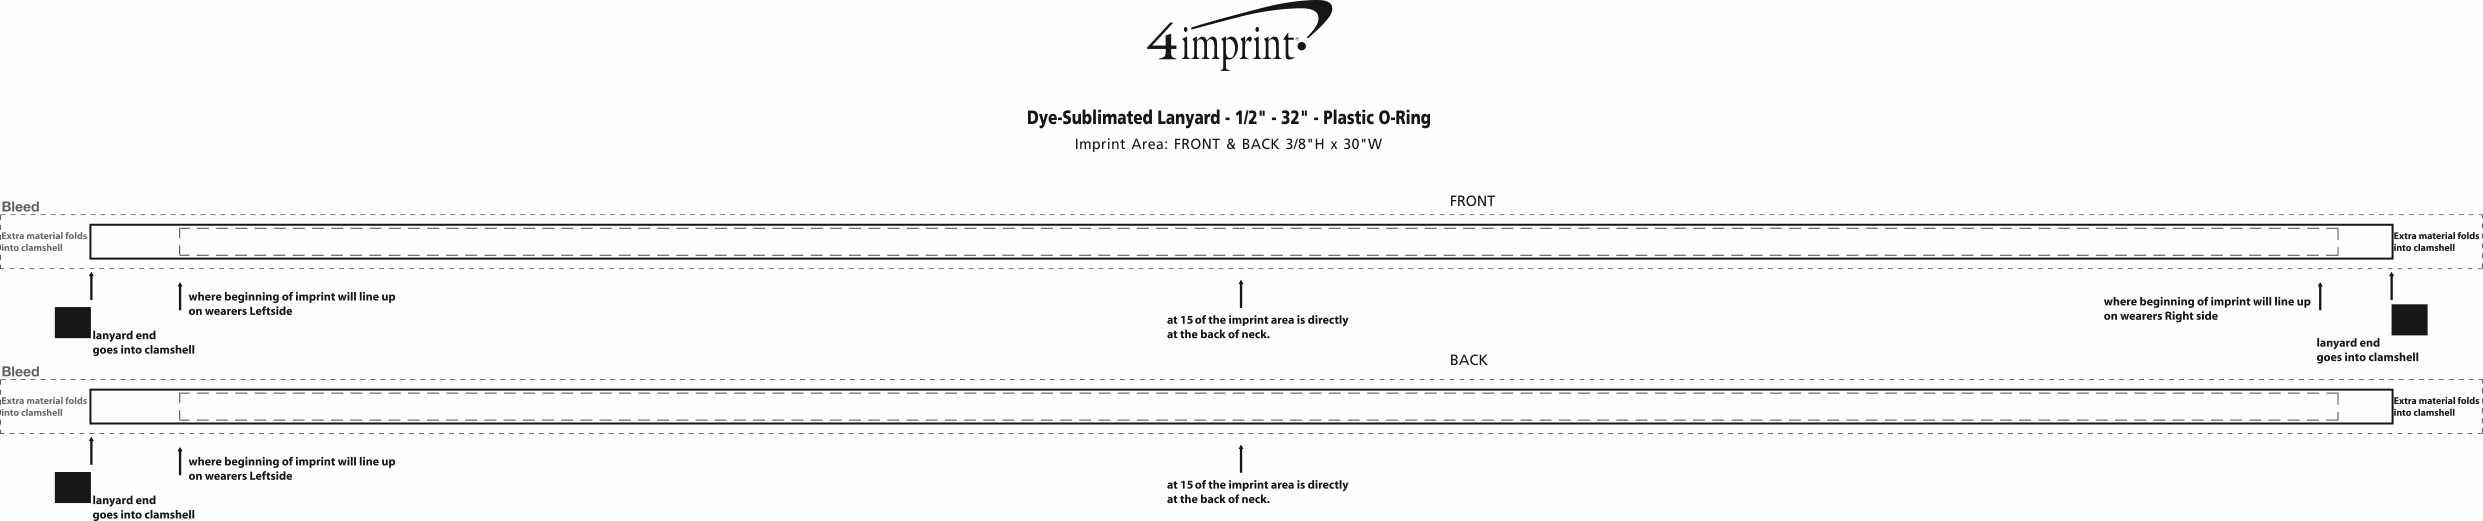 "Imprint Area of Dye-Sublimated Lanyard - 1/2"" - 32"" - Plastic O-Ring"